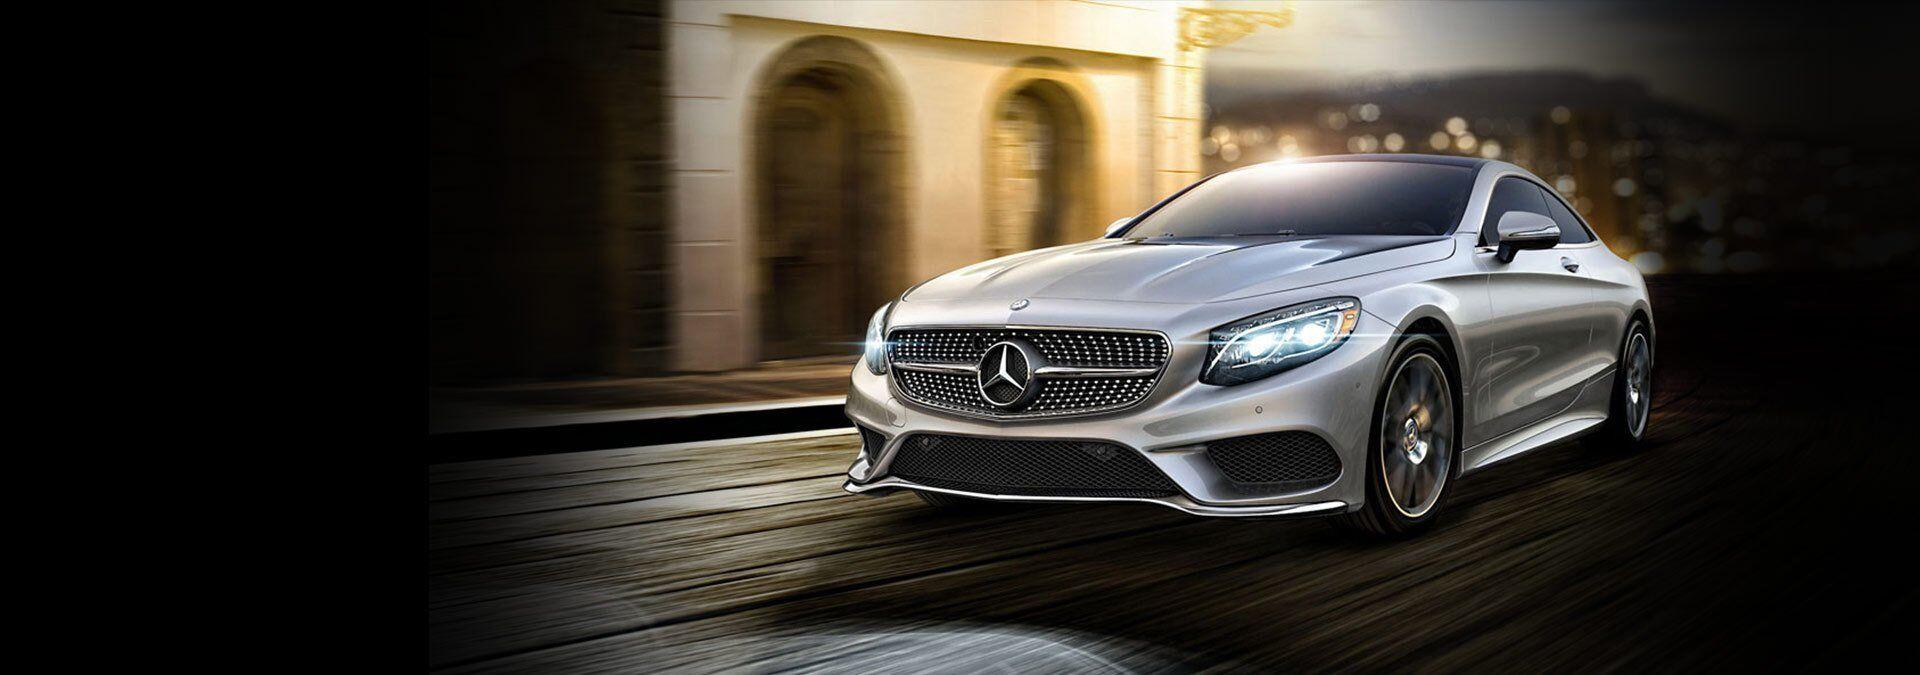 Mercedes benz of el paso dealership new used mercedes for Mercedes benz of medford parts